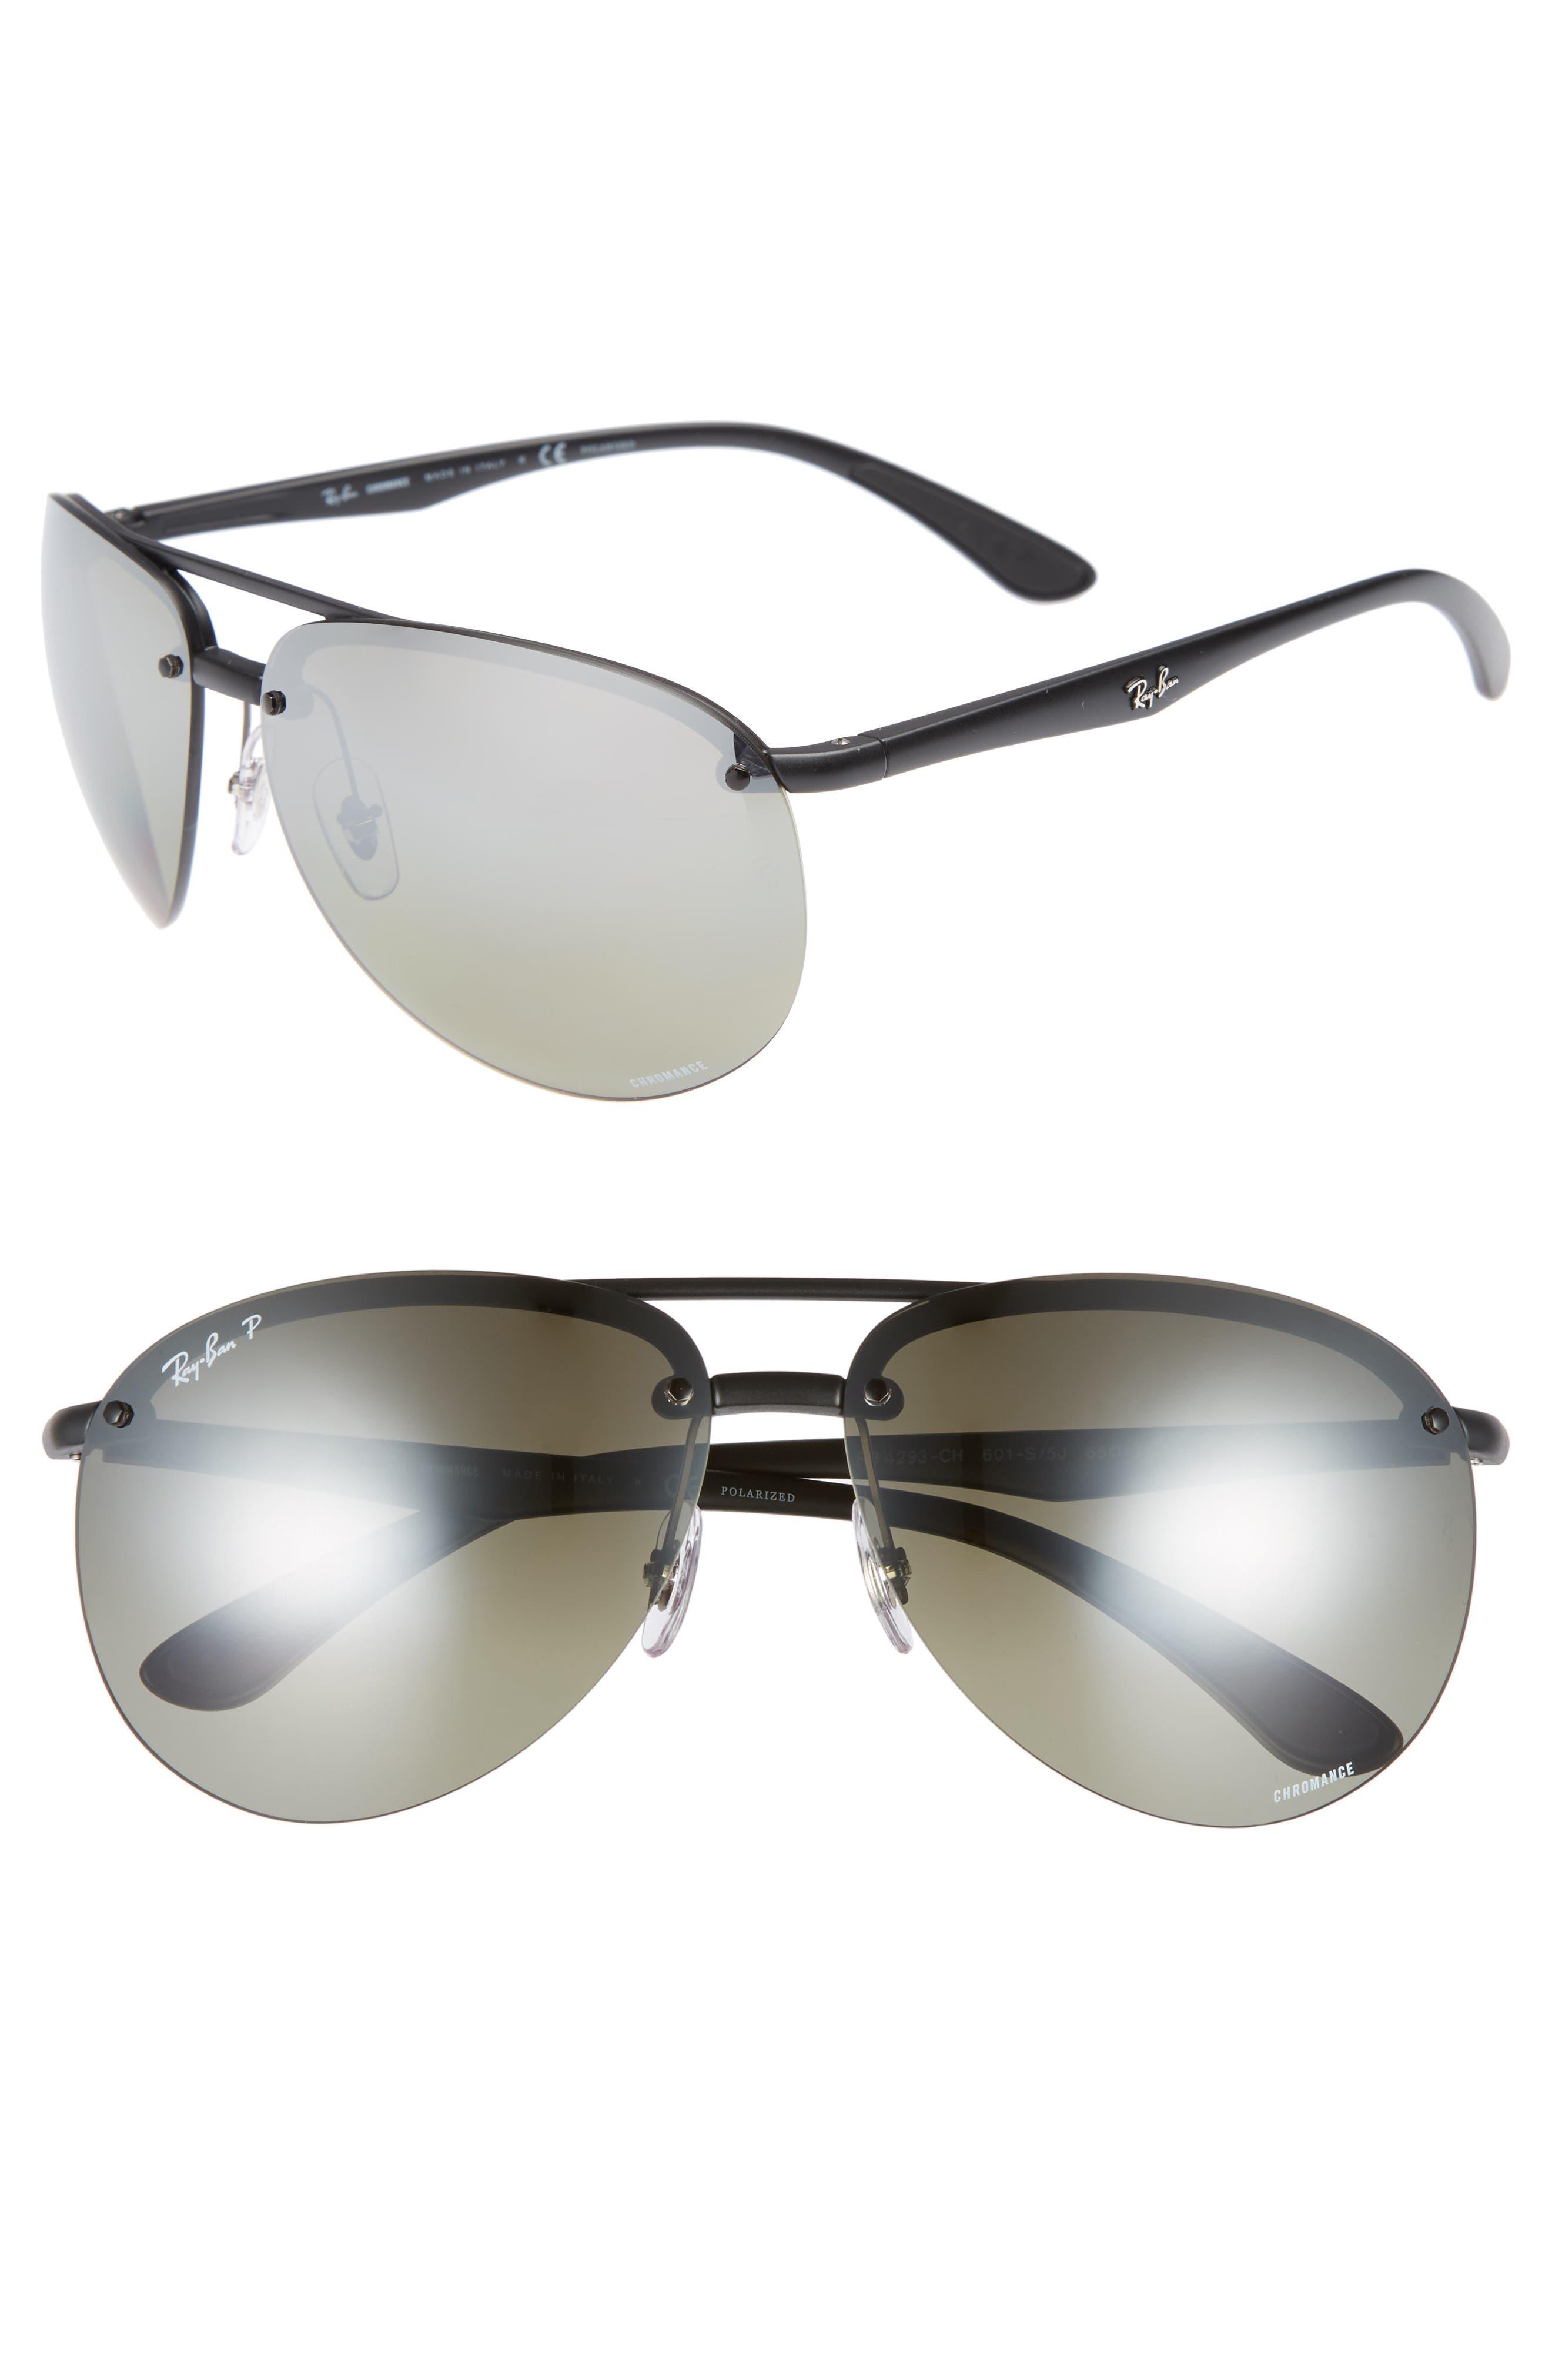 Ray-Ban 65Mm Chromance Polarized Aviator Sunglasses -